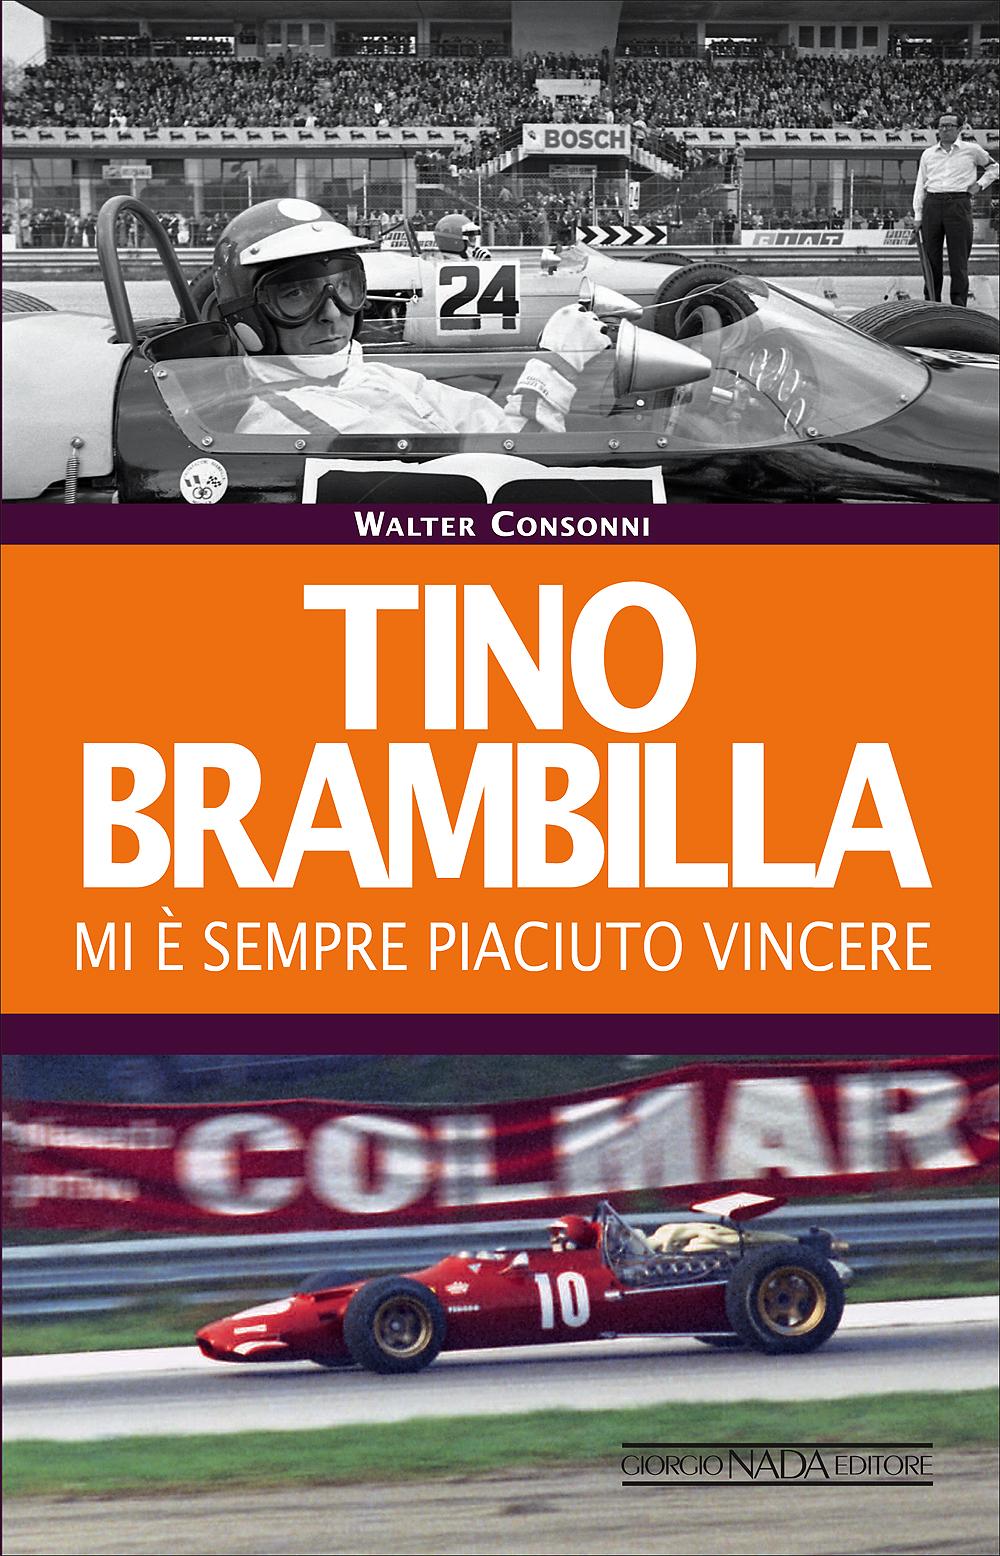 Tino Brambilla